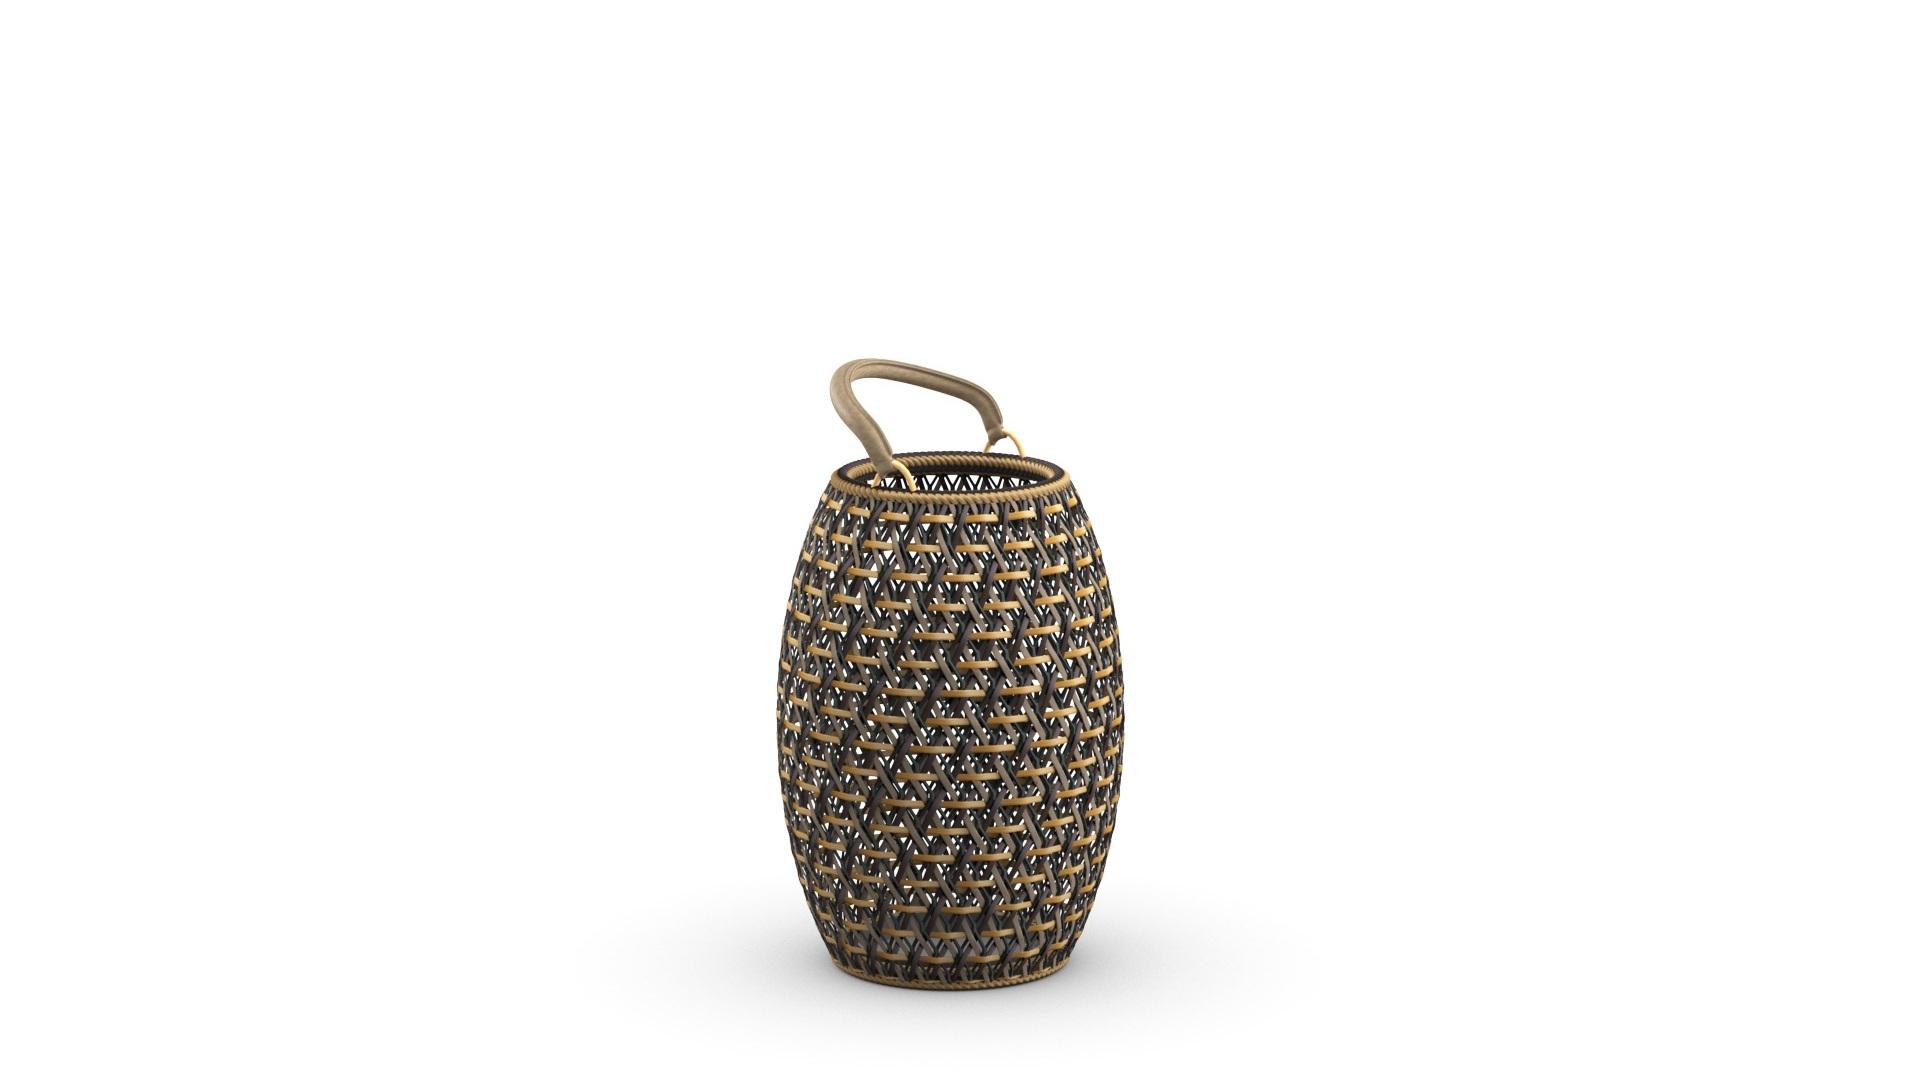 DEDON-DALA-Accessories-Lantern-M-rioja.jpg